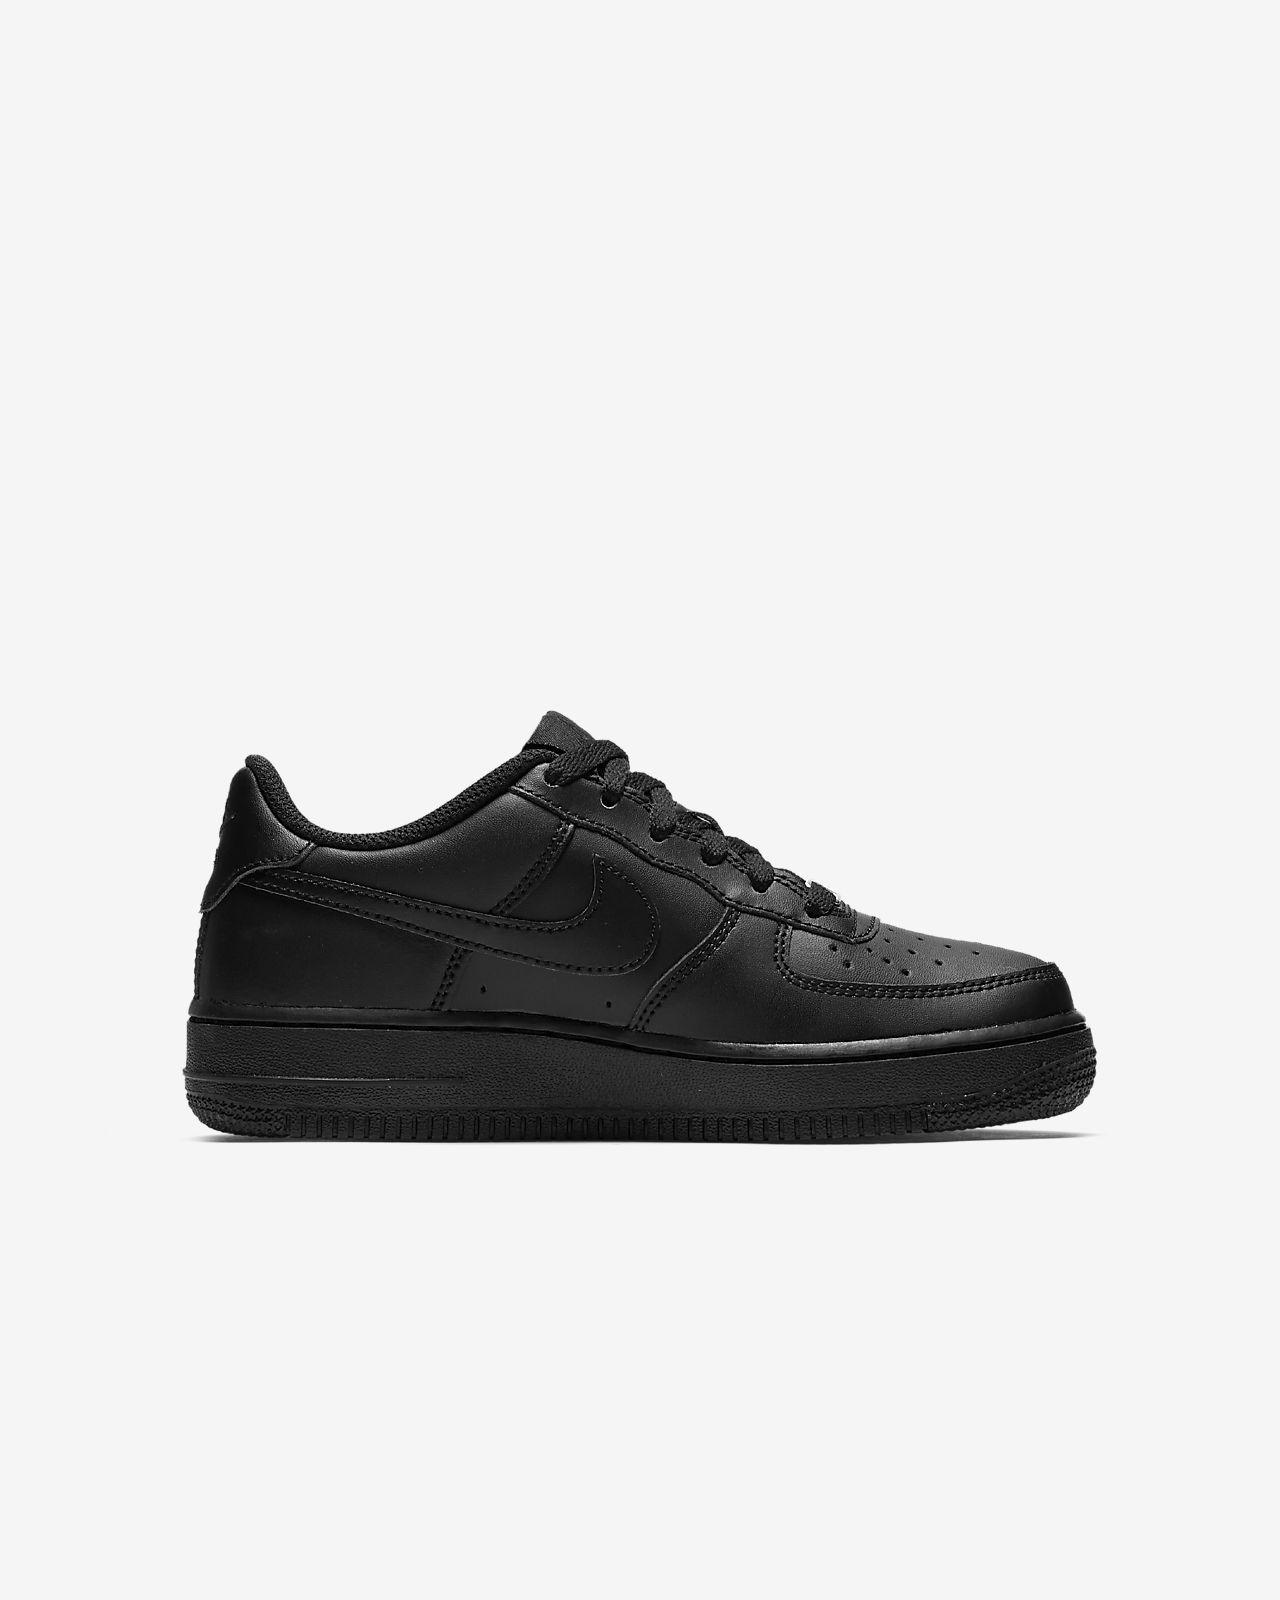 hot sale online b82c4 ffcf7 ... Nike Air Force 1 Zapatillas - Niño a